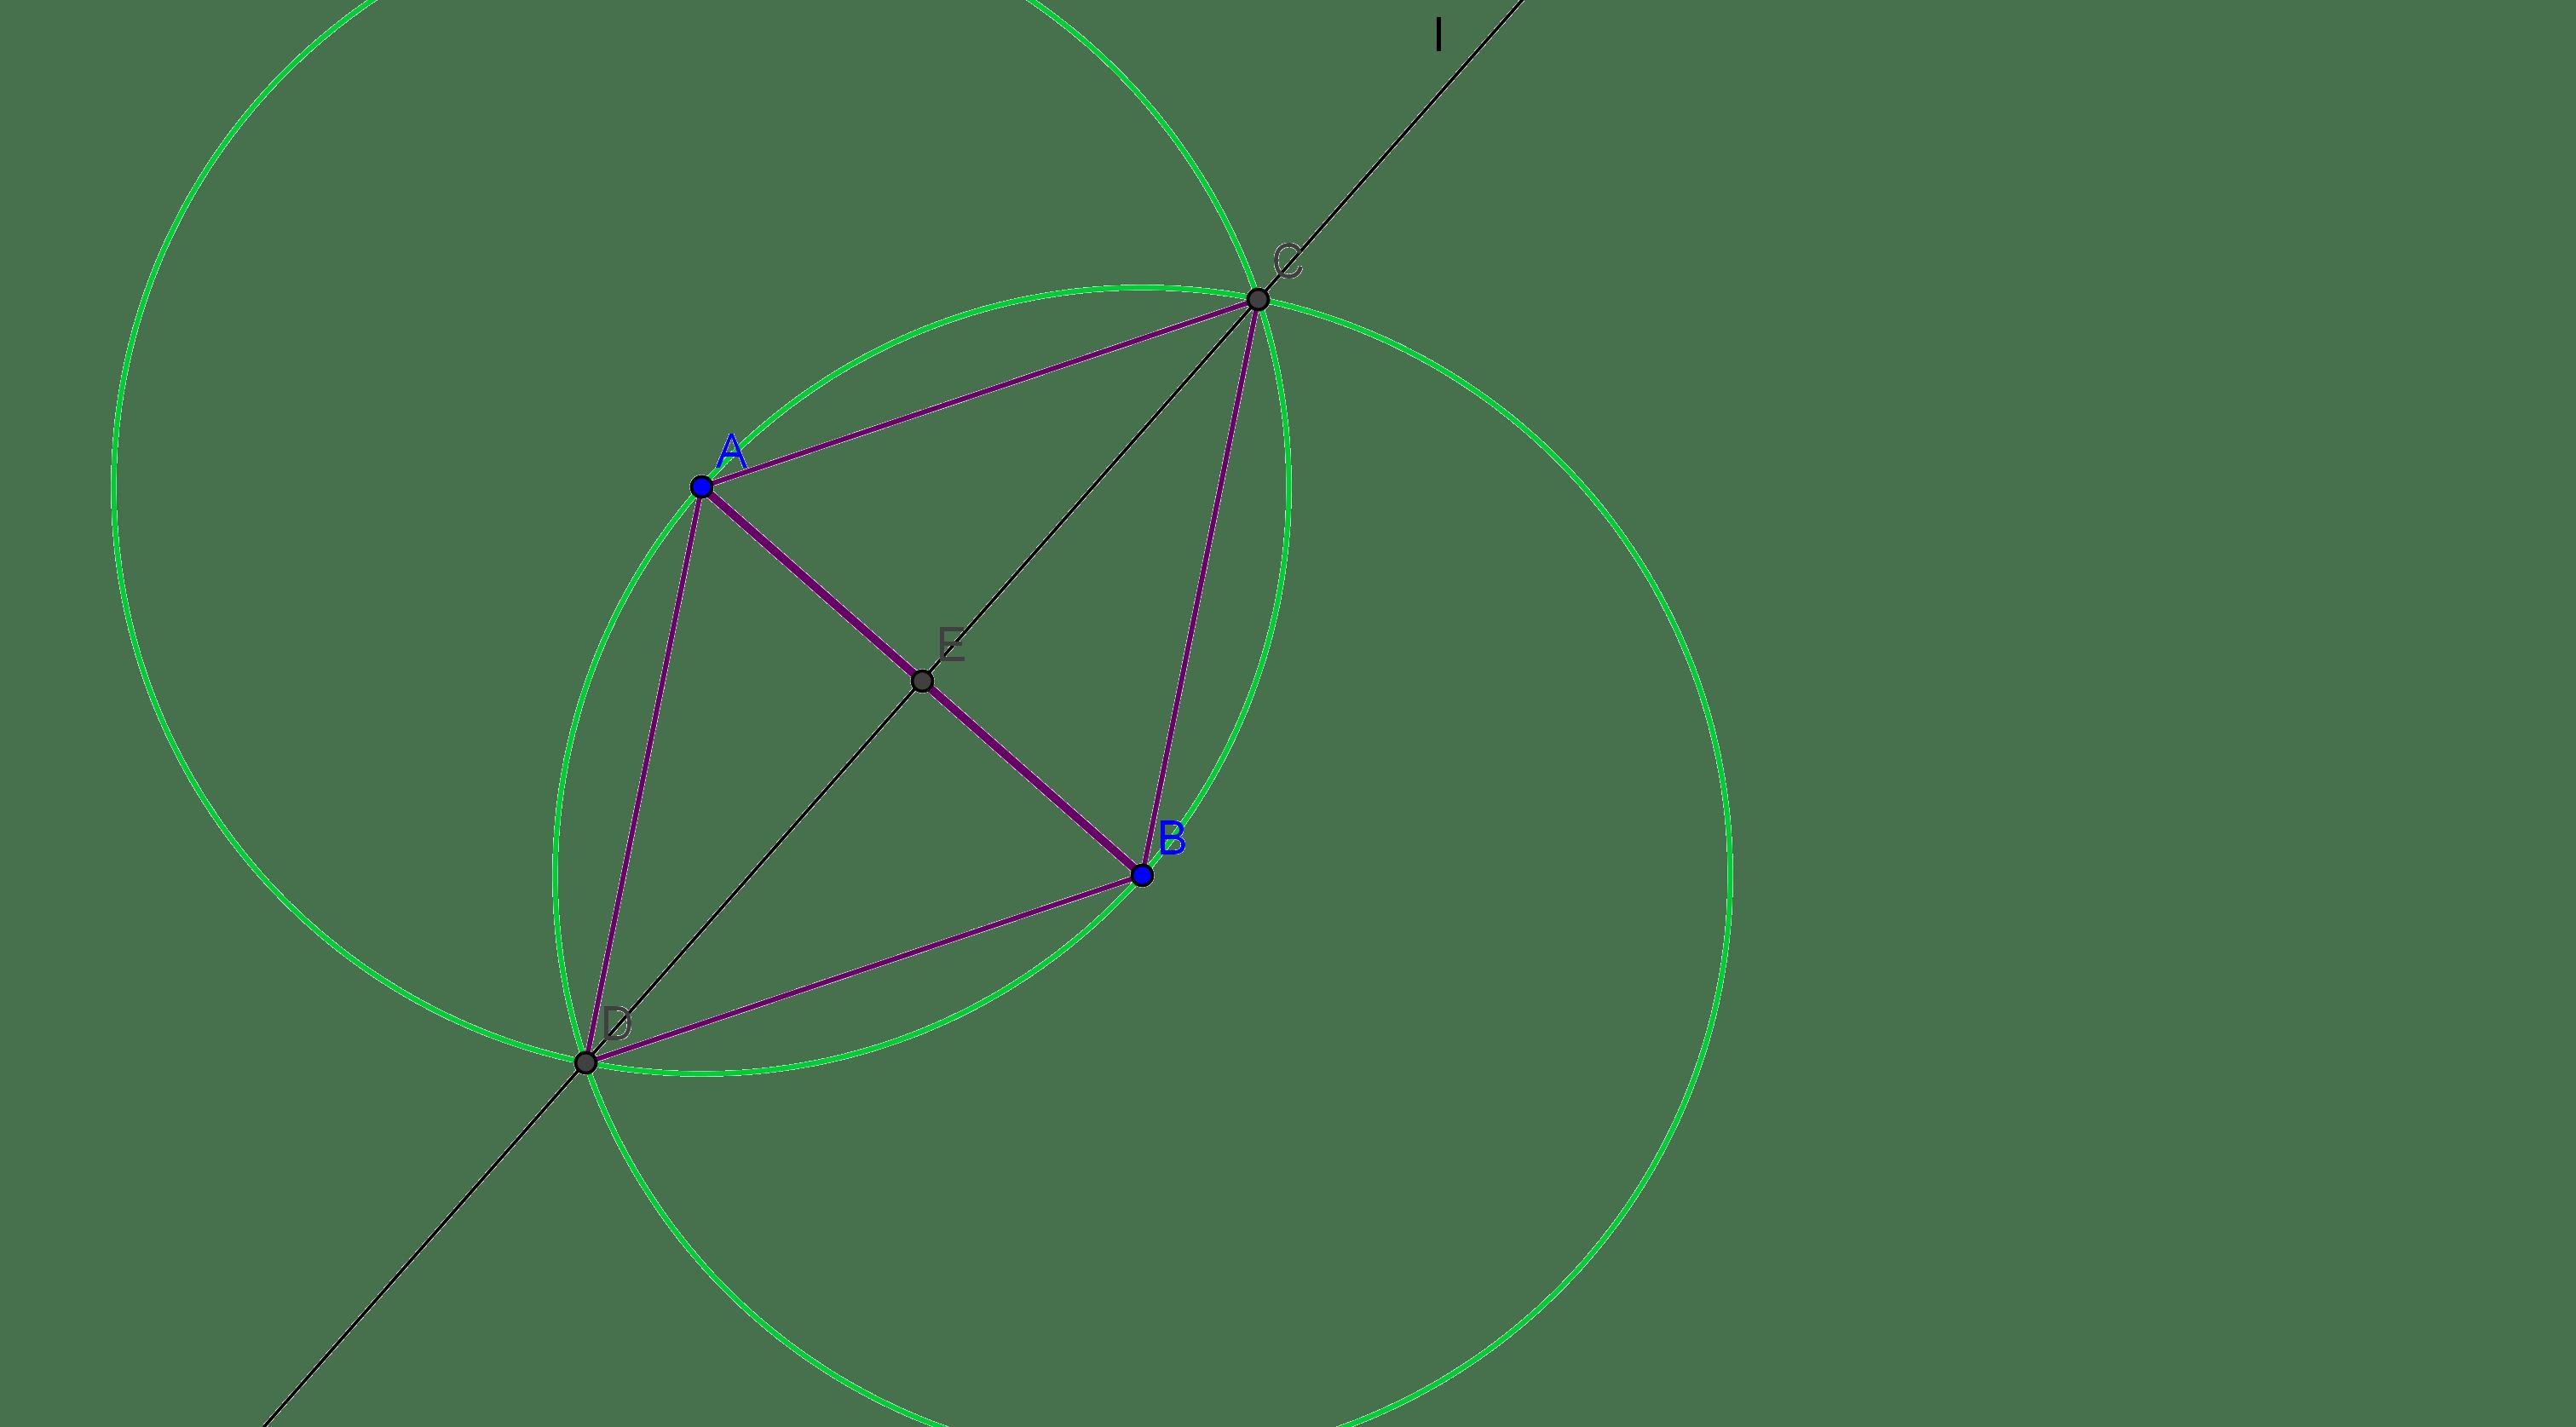 Perpendicular Bisectors